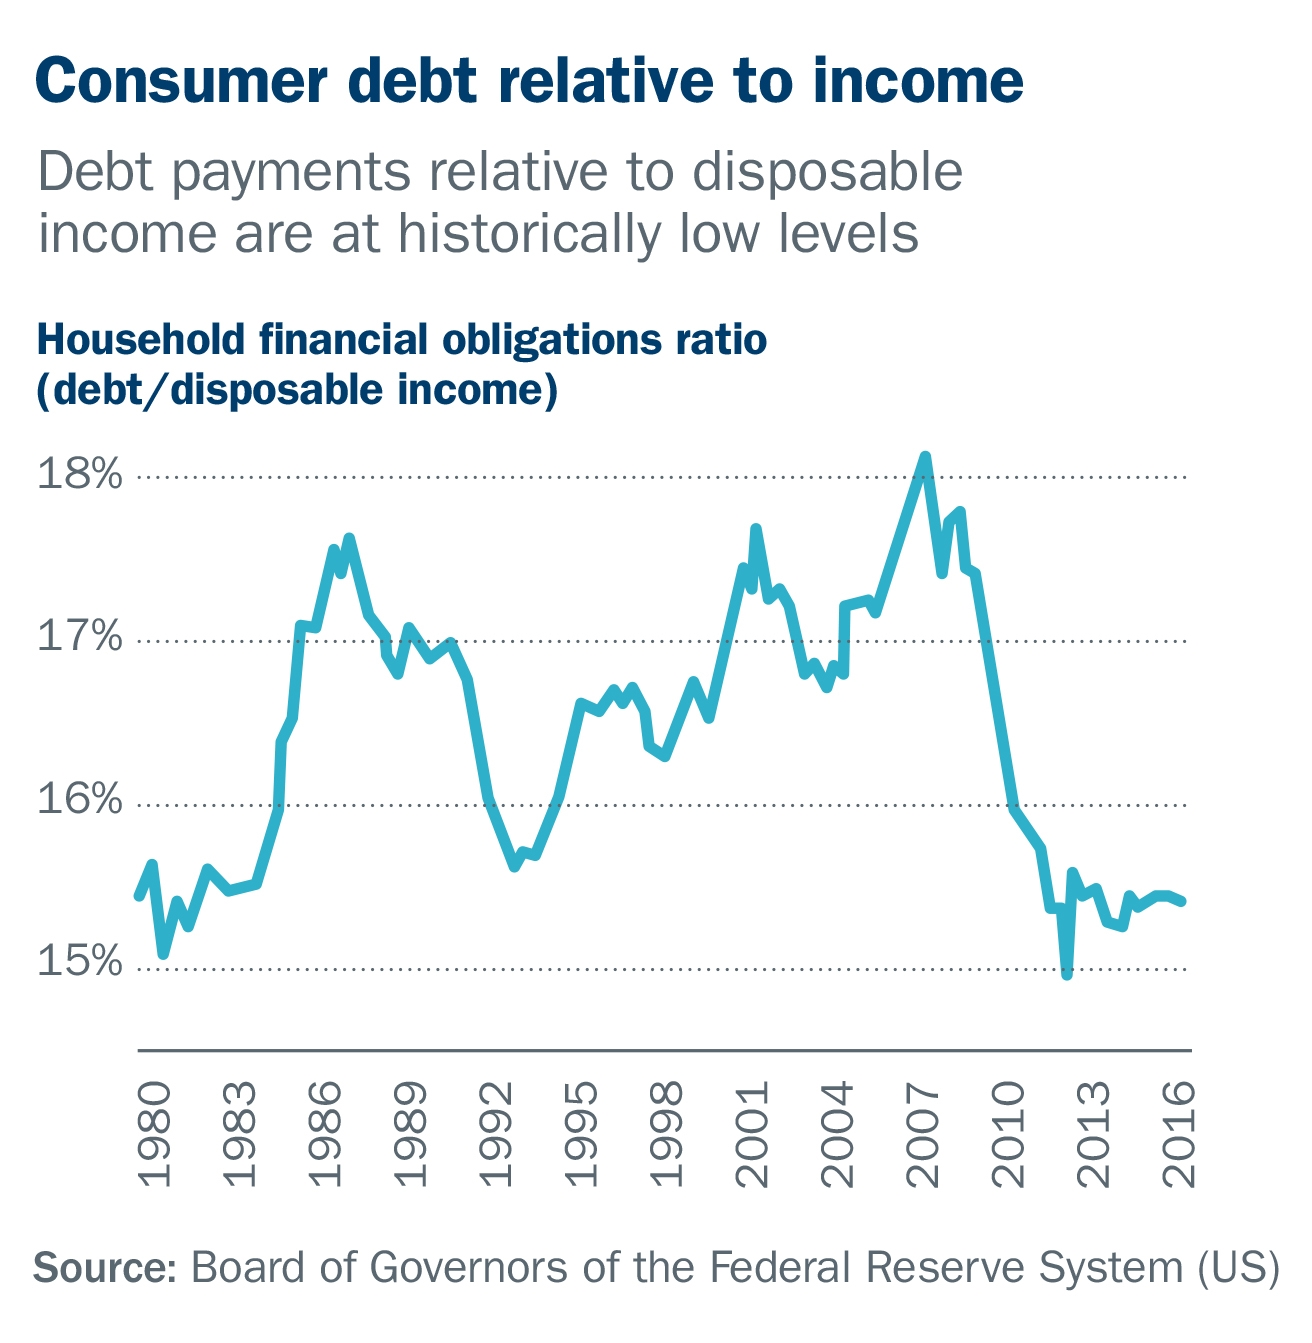 consumer debt relative to income